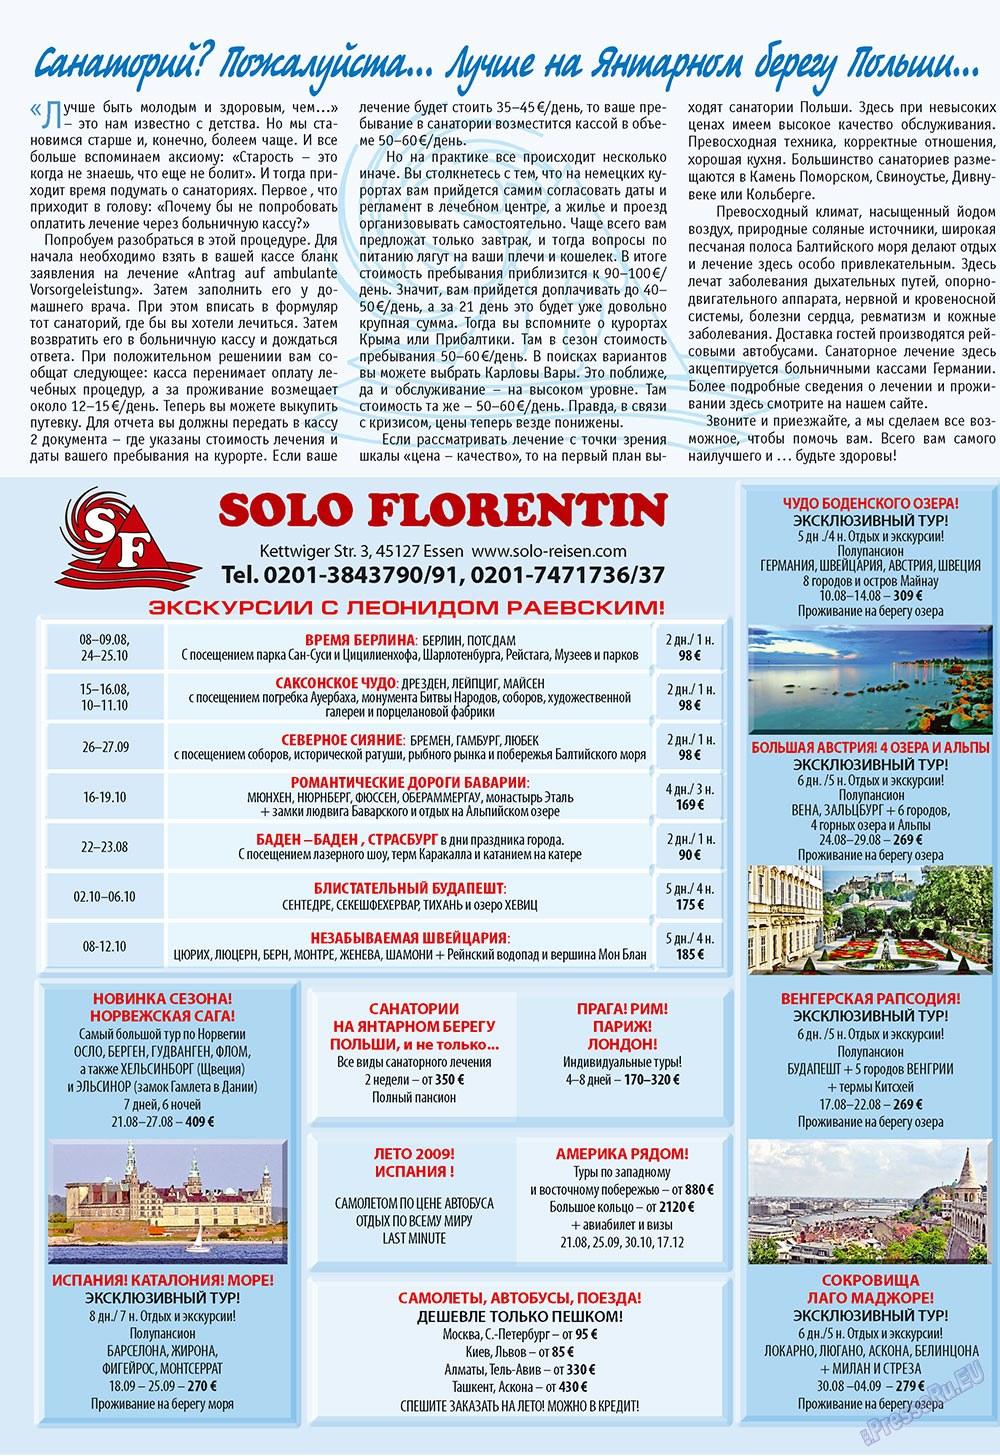 Наше Турбюро (журнал). 2009 год, номер 4, стр. 41